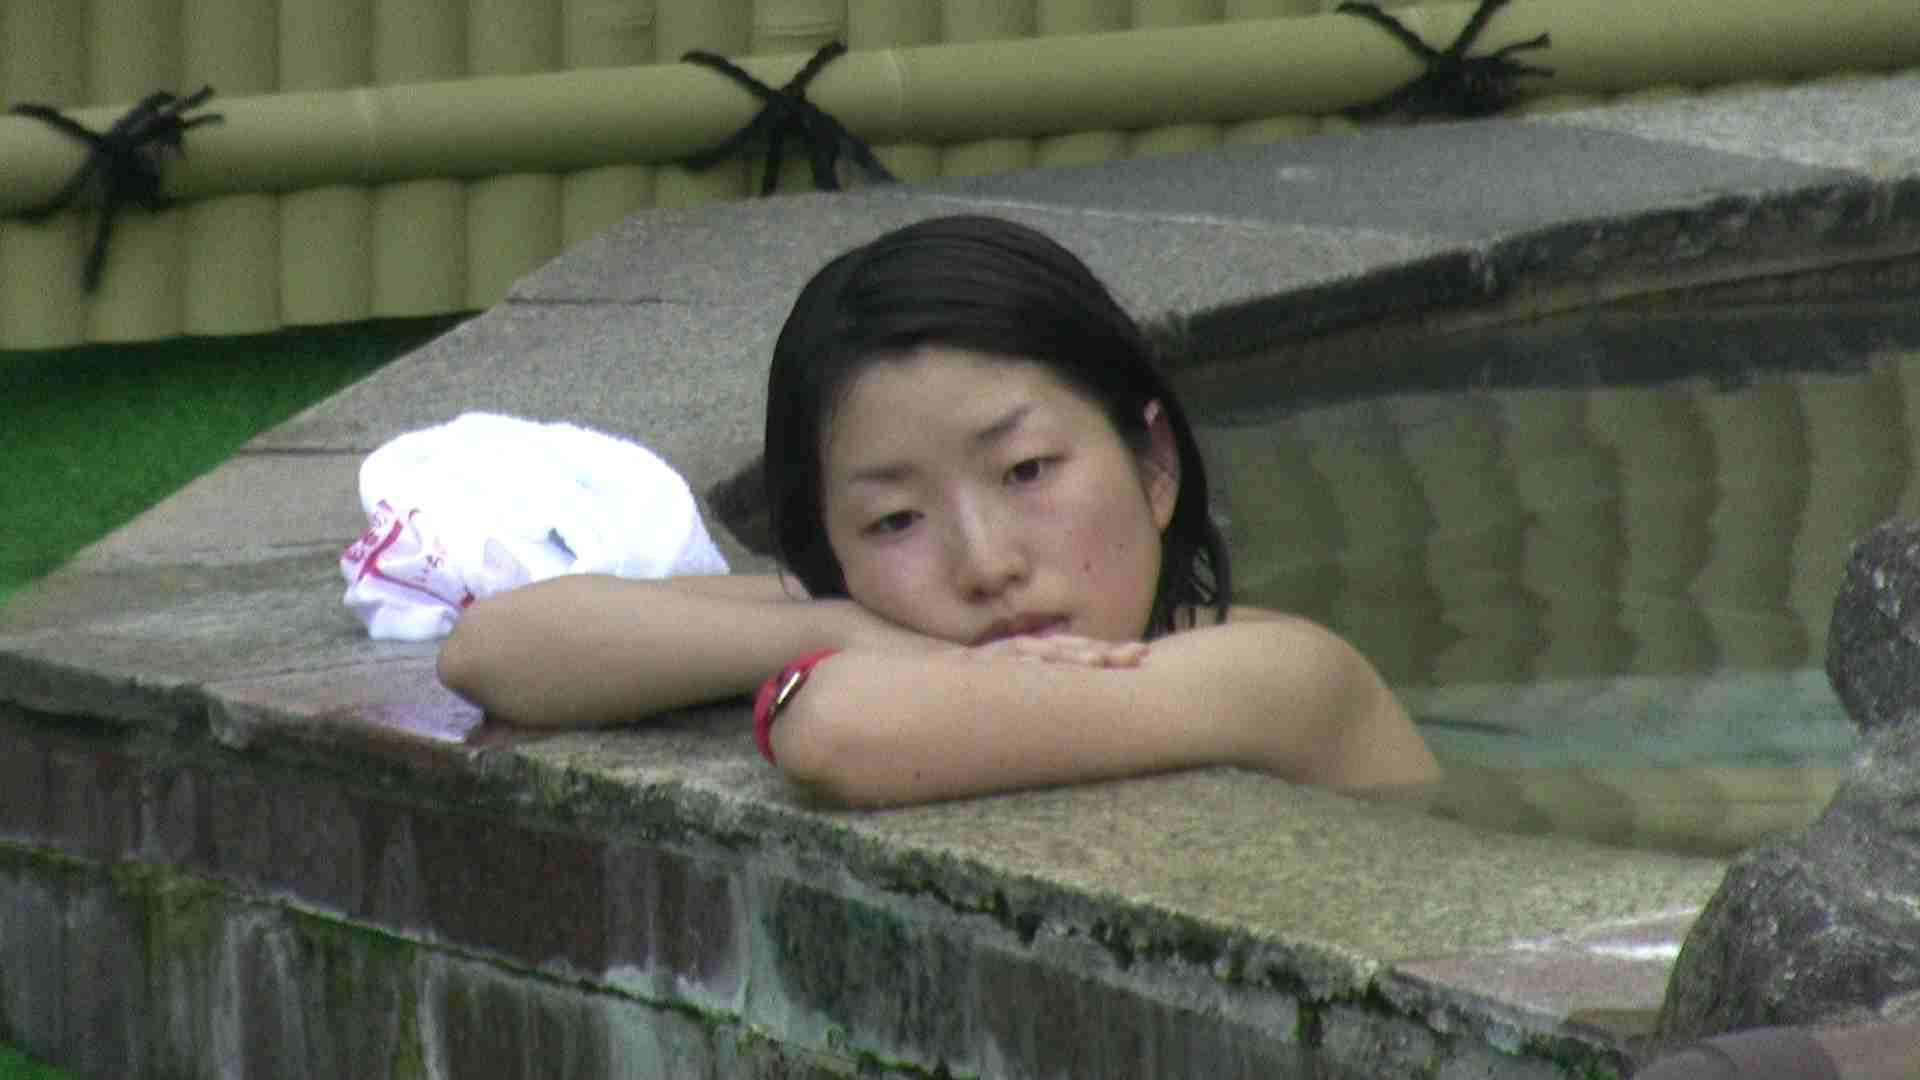 Aquaな露天風呂Vol.133 0  19連発 10